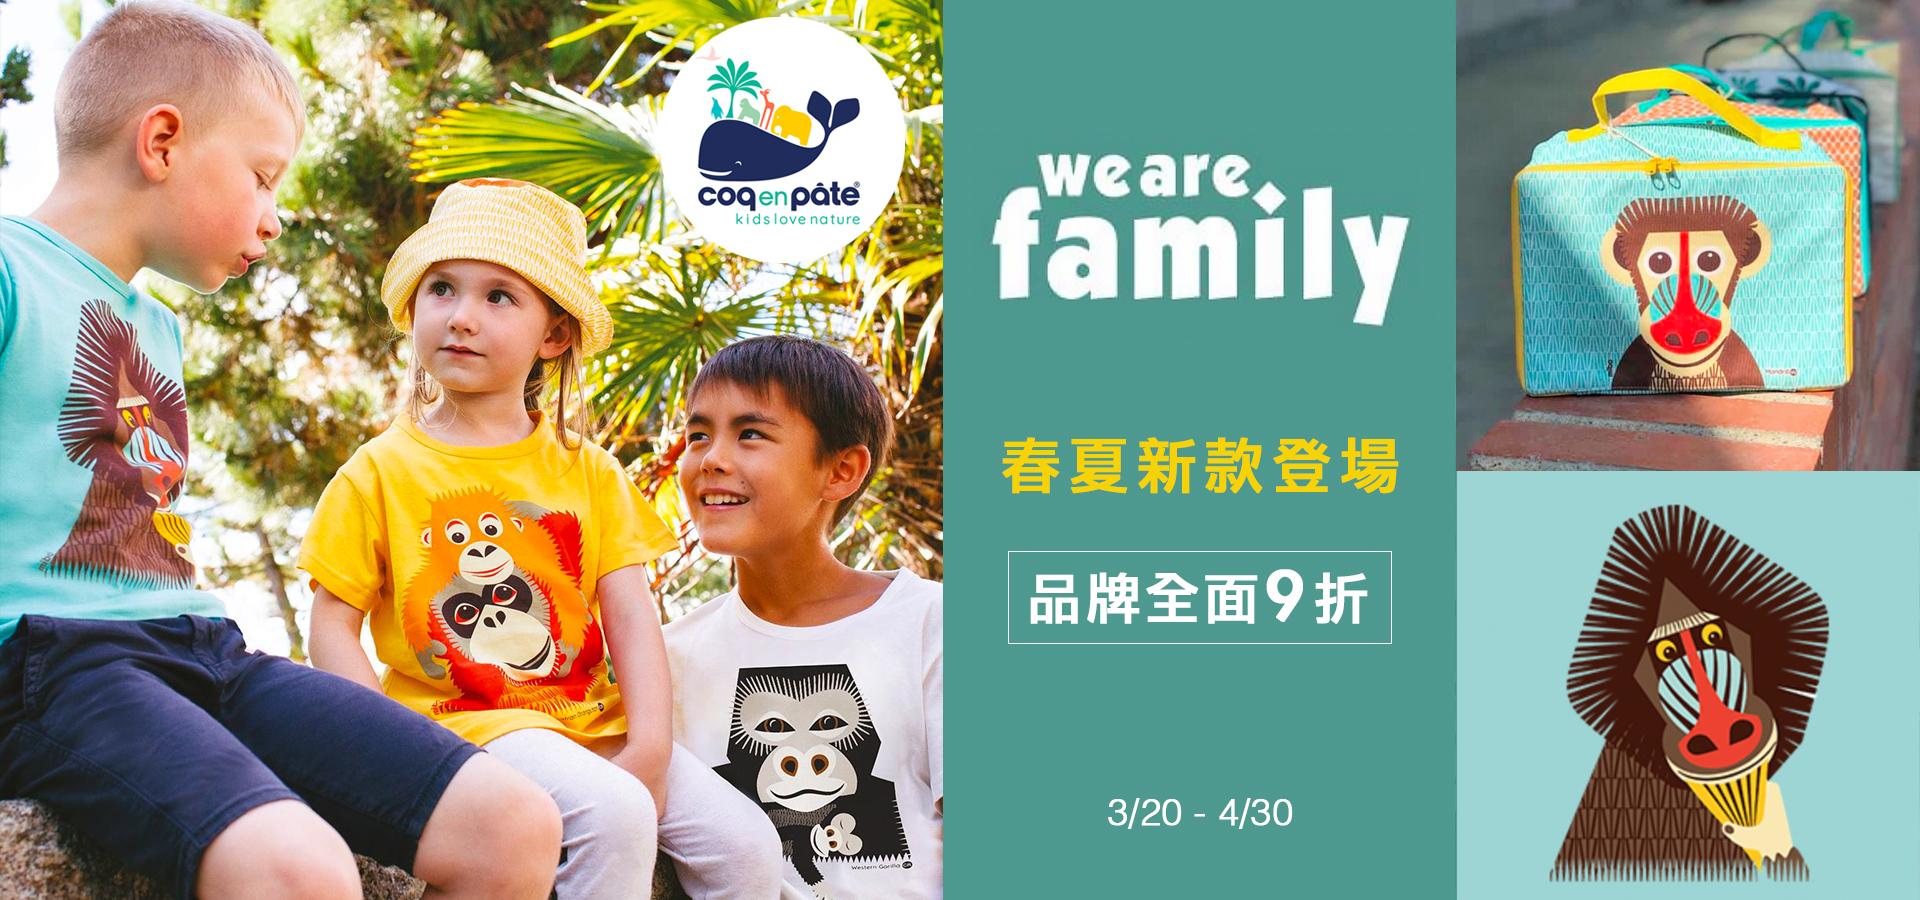 Coq En Pate春夏新款登場品牌全面9折